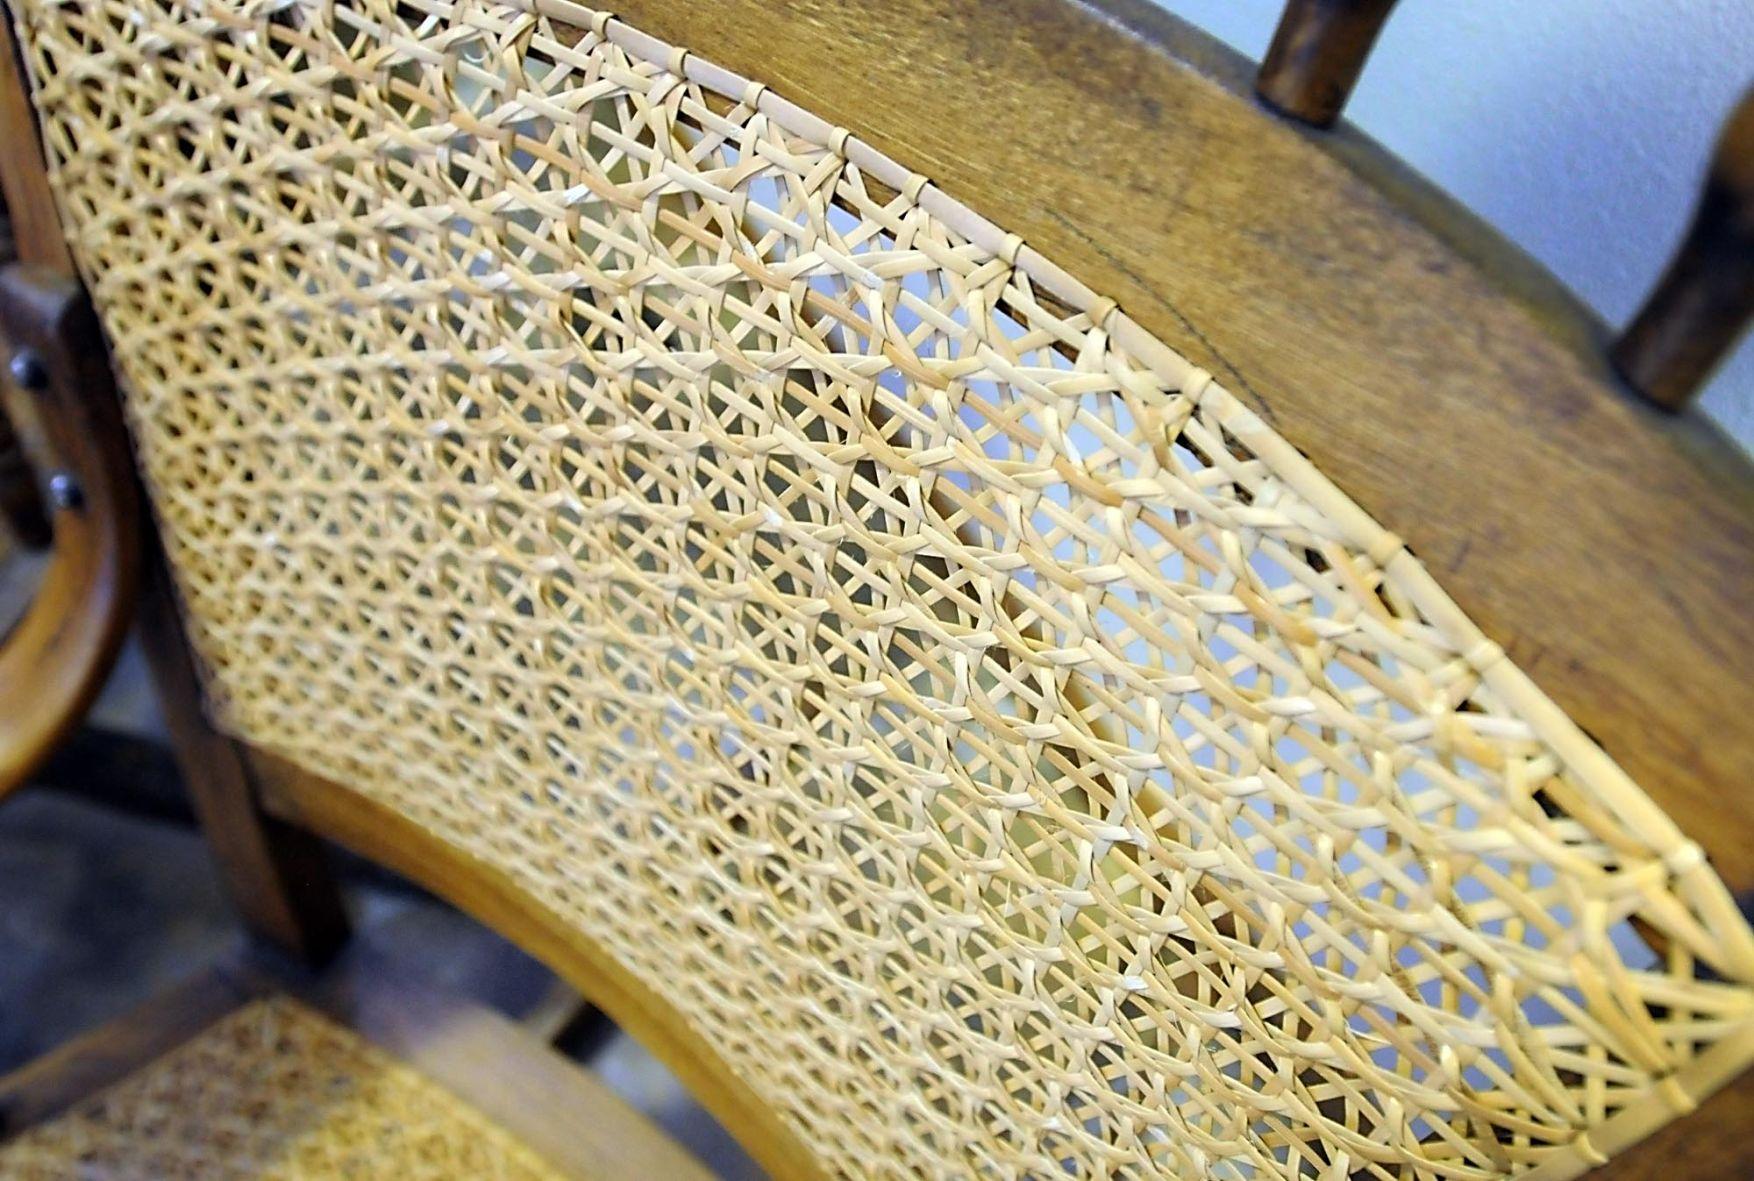 antique cane chairs fold up desk chair retired msu professor a chair-weaving whiz | lifestyles mankatofreepress.com